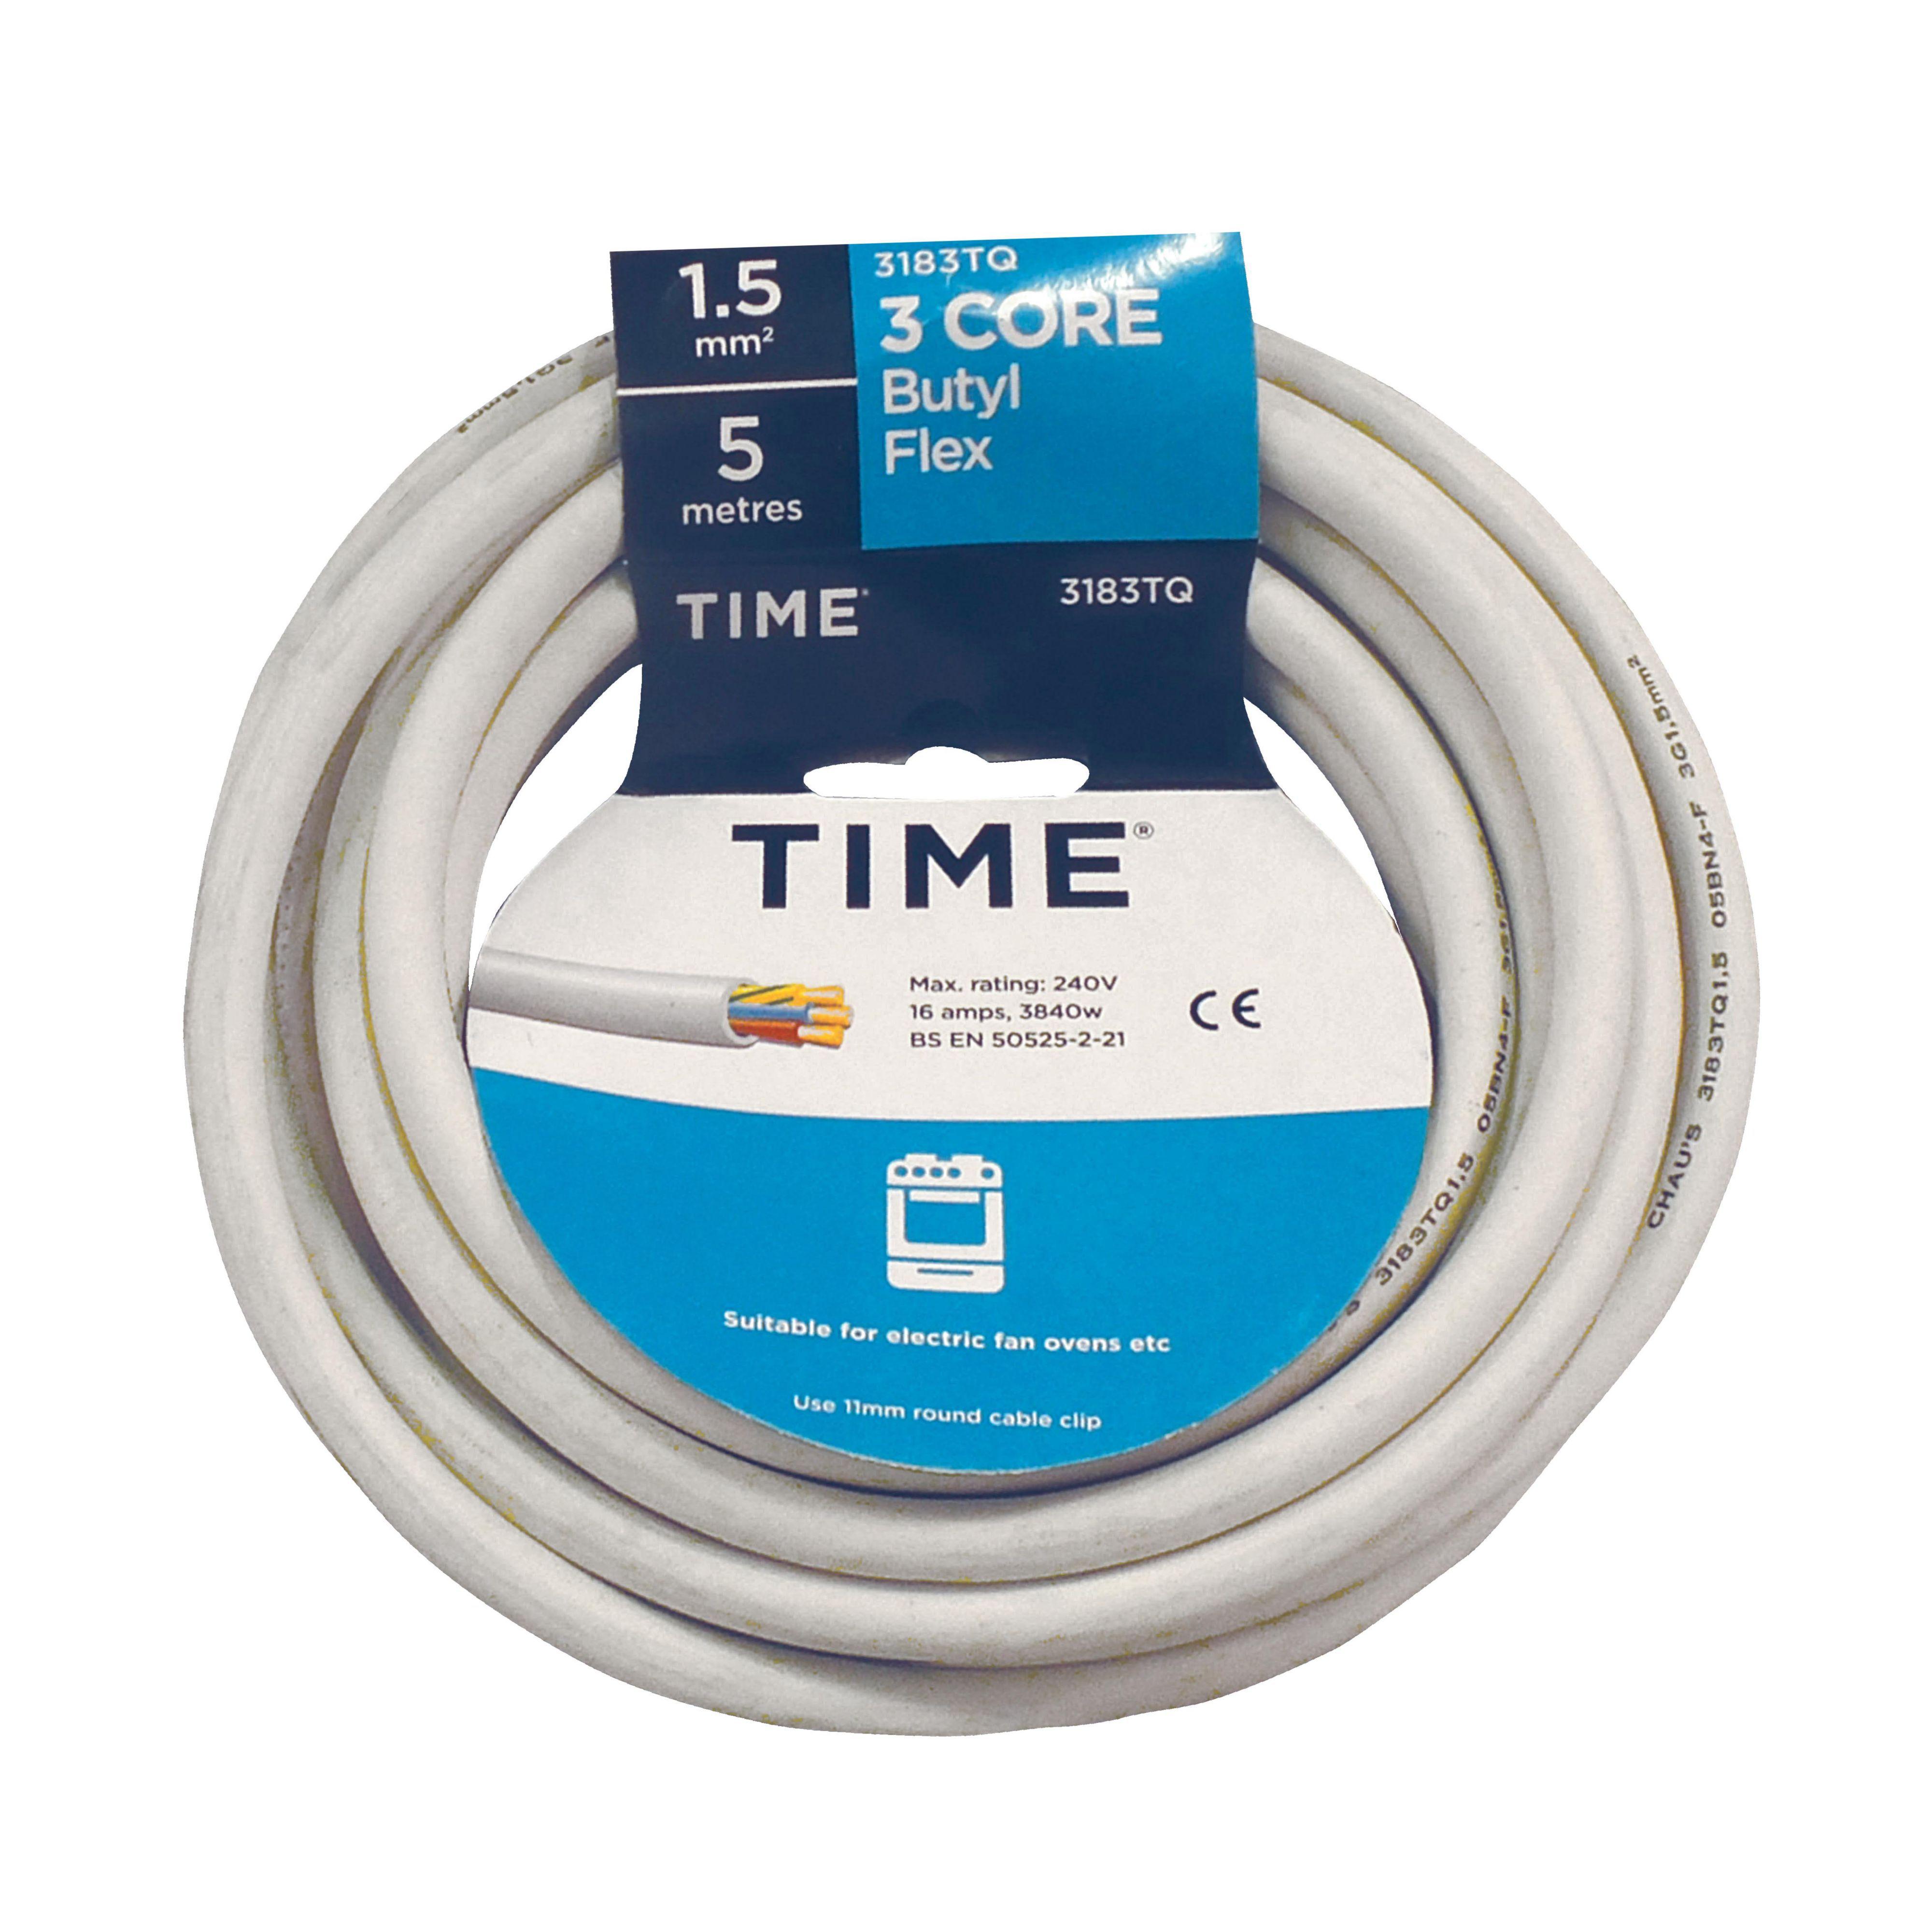 Time 3 Core Butyl Heat Resistant Flexible Cable 1.5mm² 3183Tq White ...